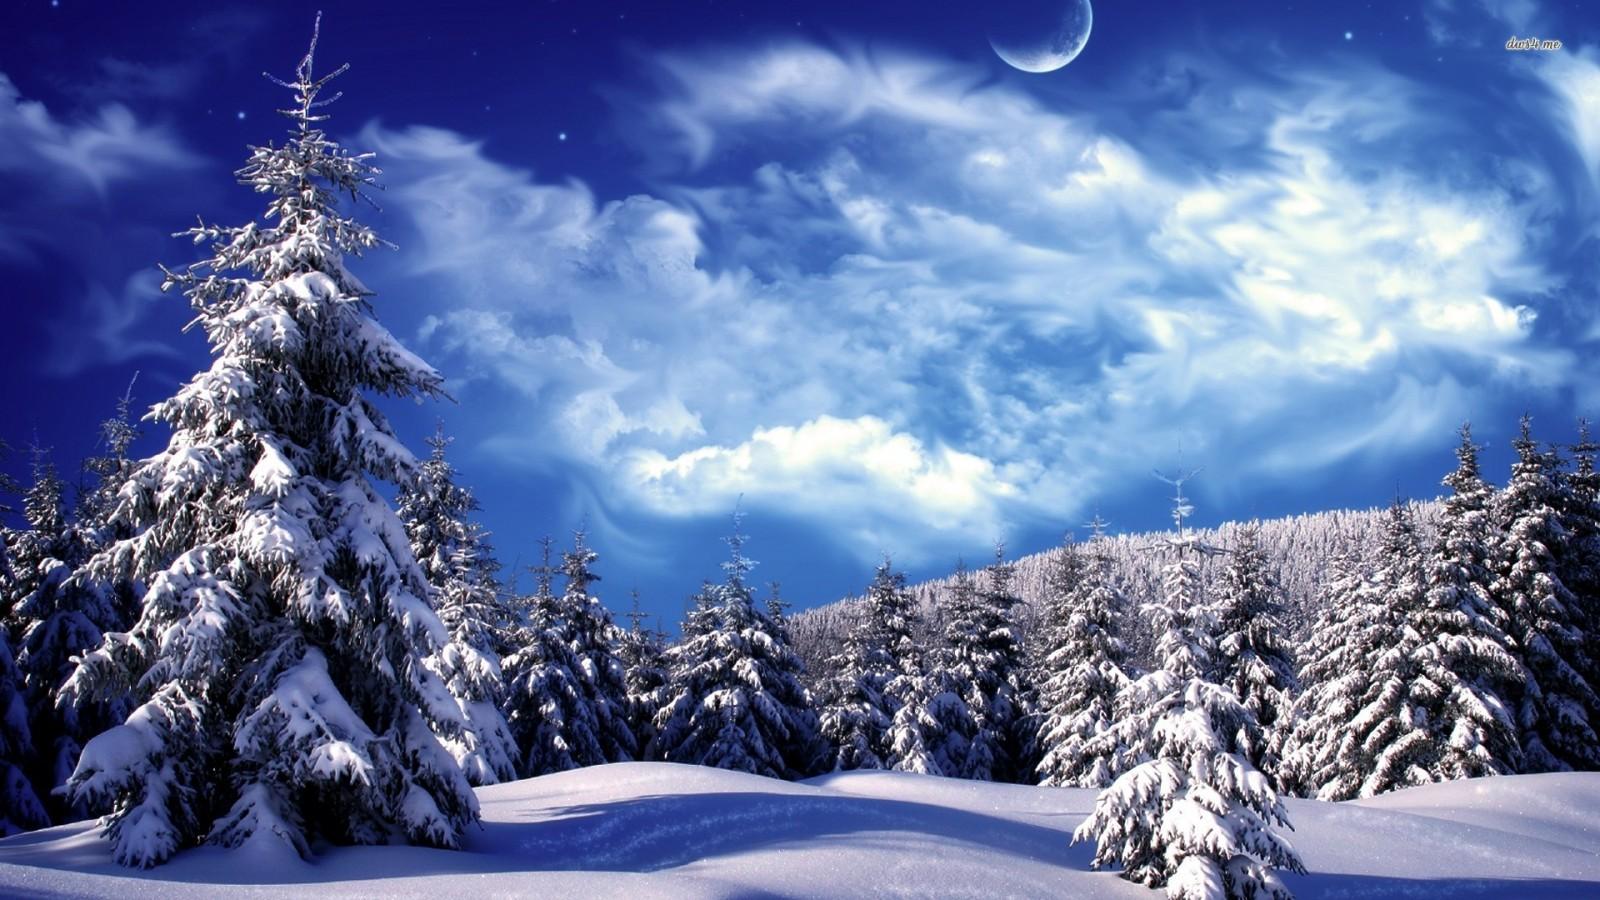 awesome-winter-wonderland-full-hd-wallpapr